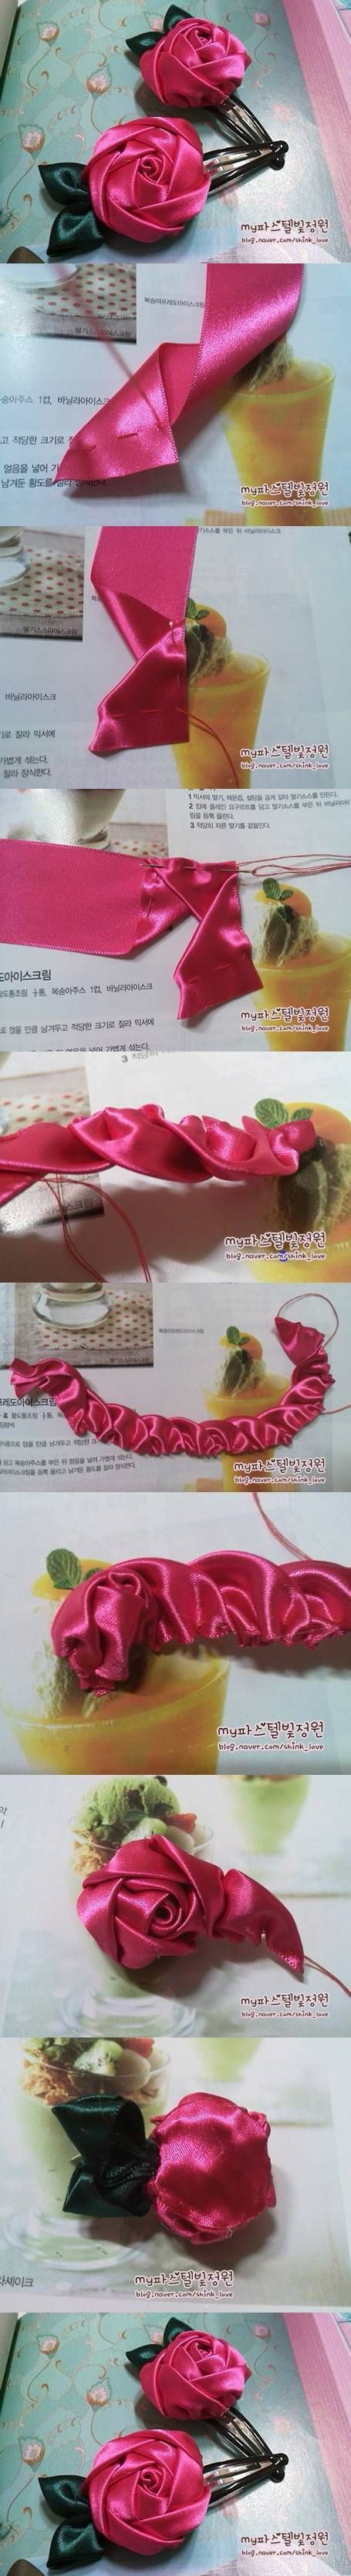 DIY Rose of Organza Ribbon DIY Projects / UsefulDIY.com